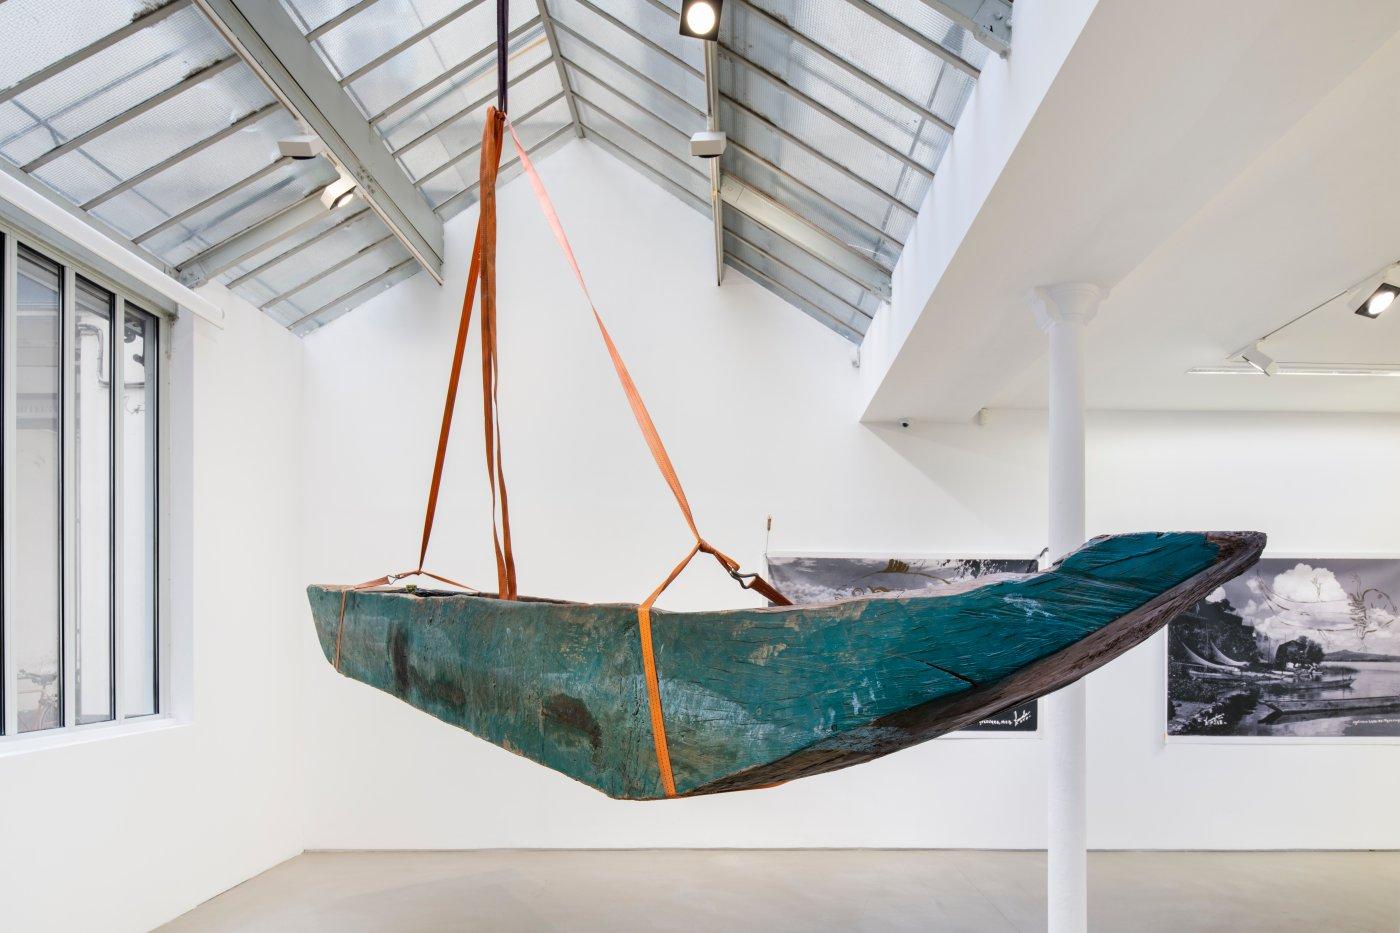 Galerie Chantal Crousel Rhe 2